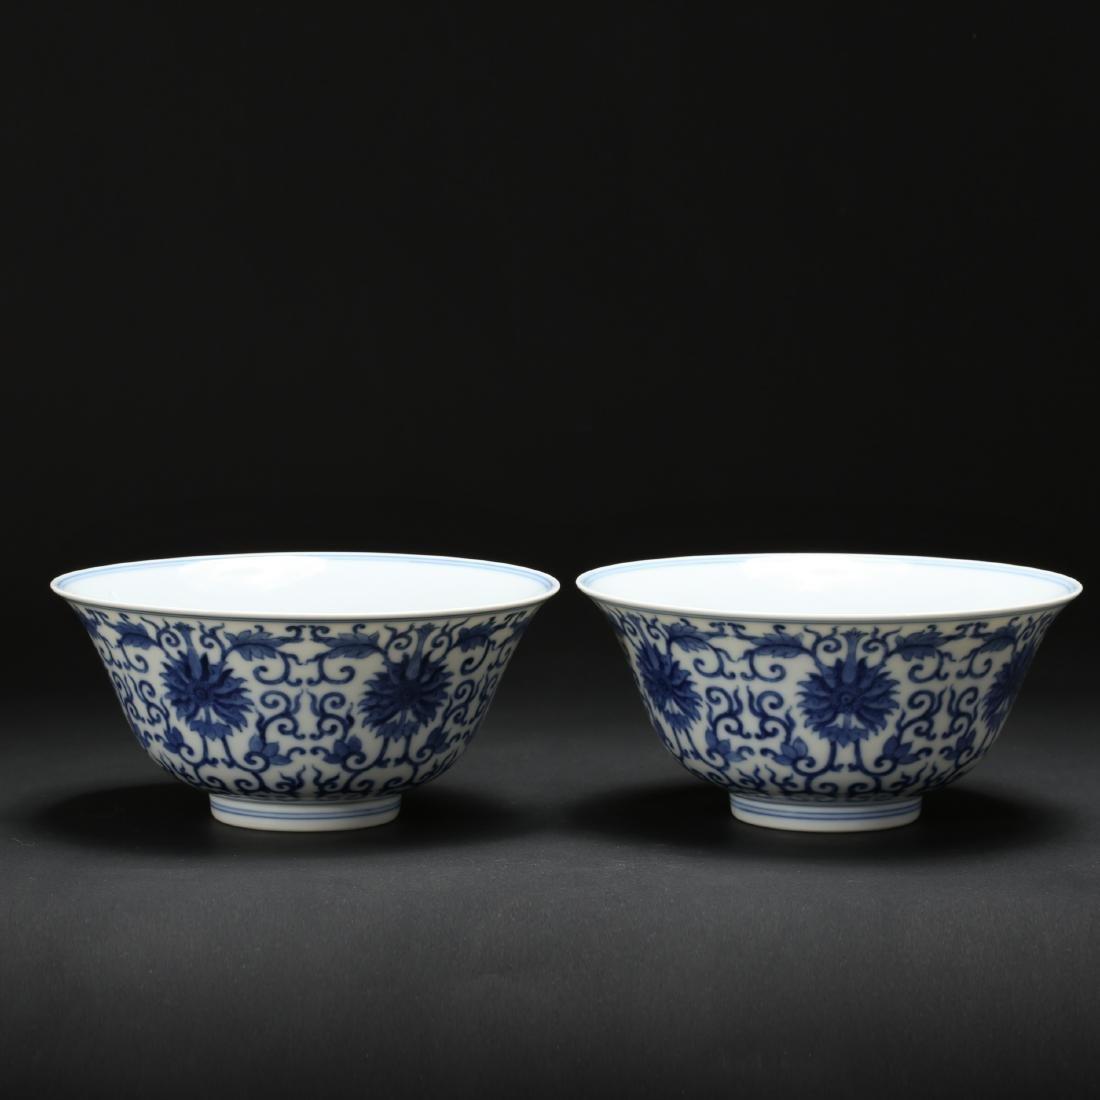 CHINESE BLUE AND WHITE FOLIAGE BOWLS